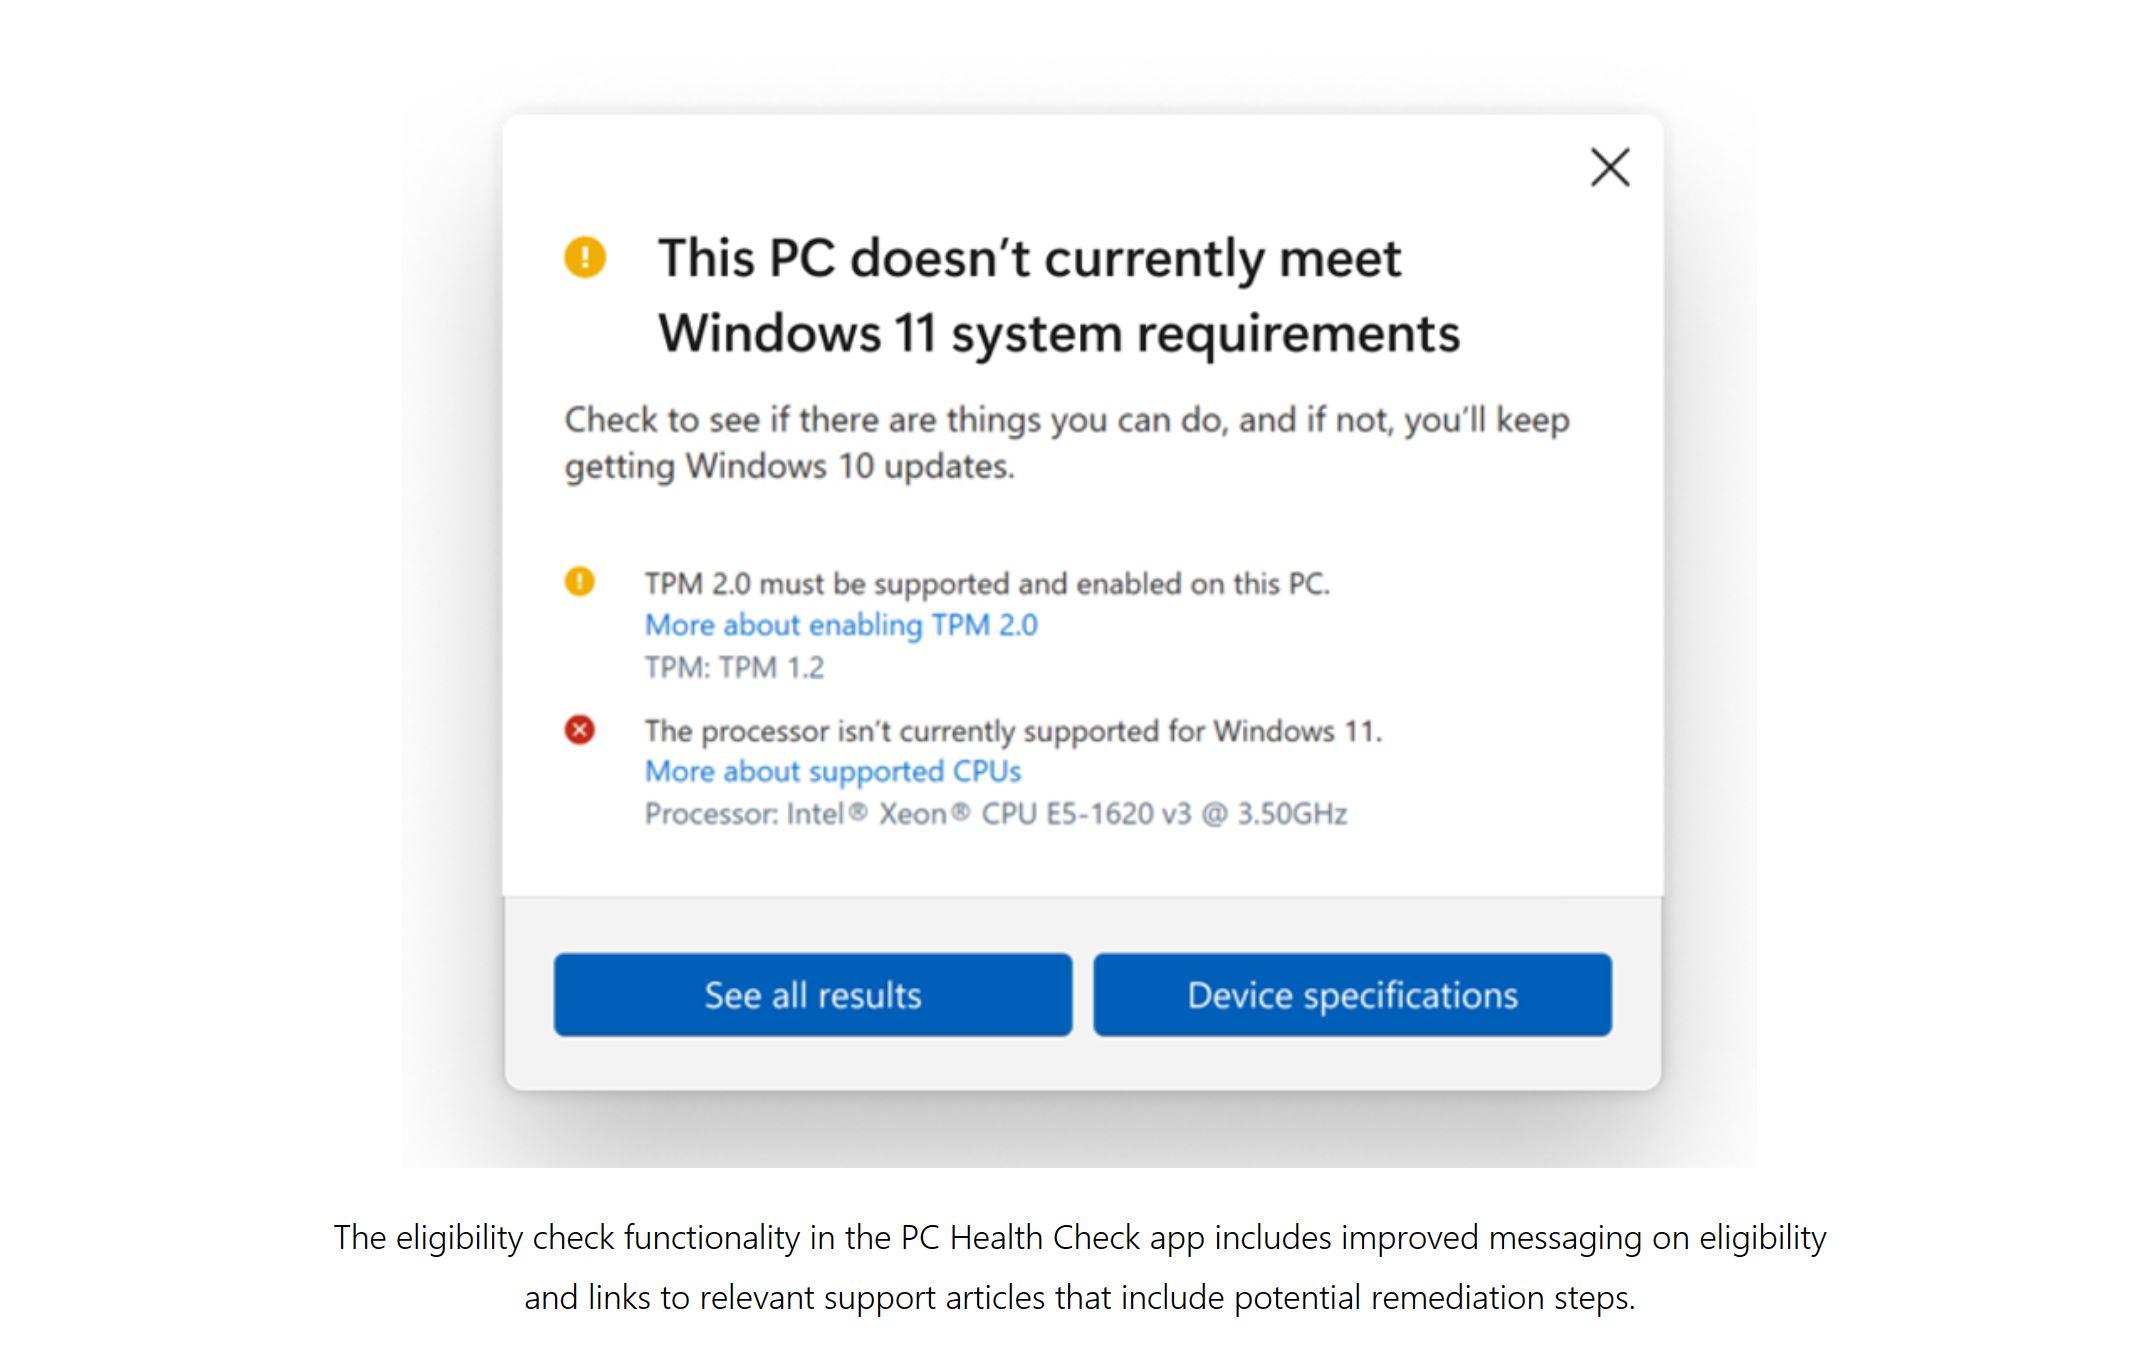 Microsoft PC Health Check app Windows 11